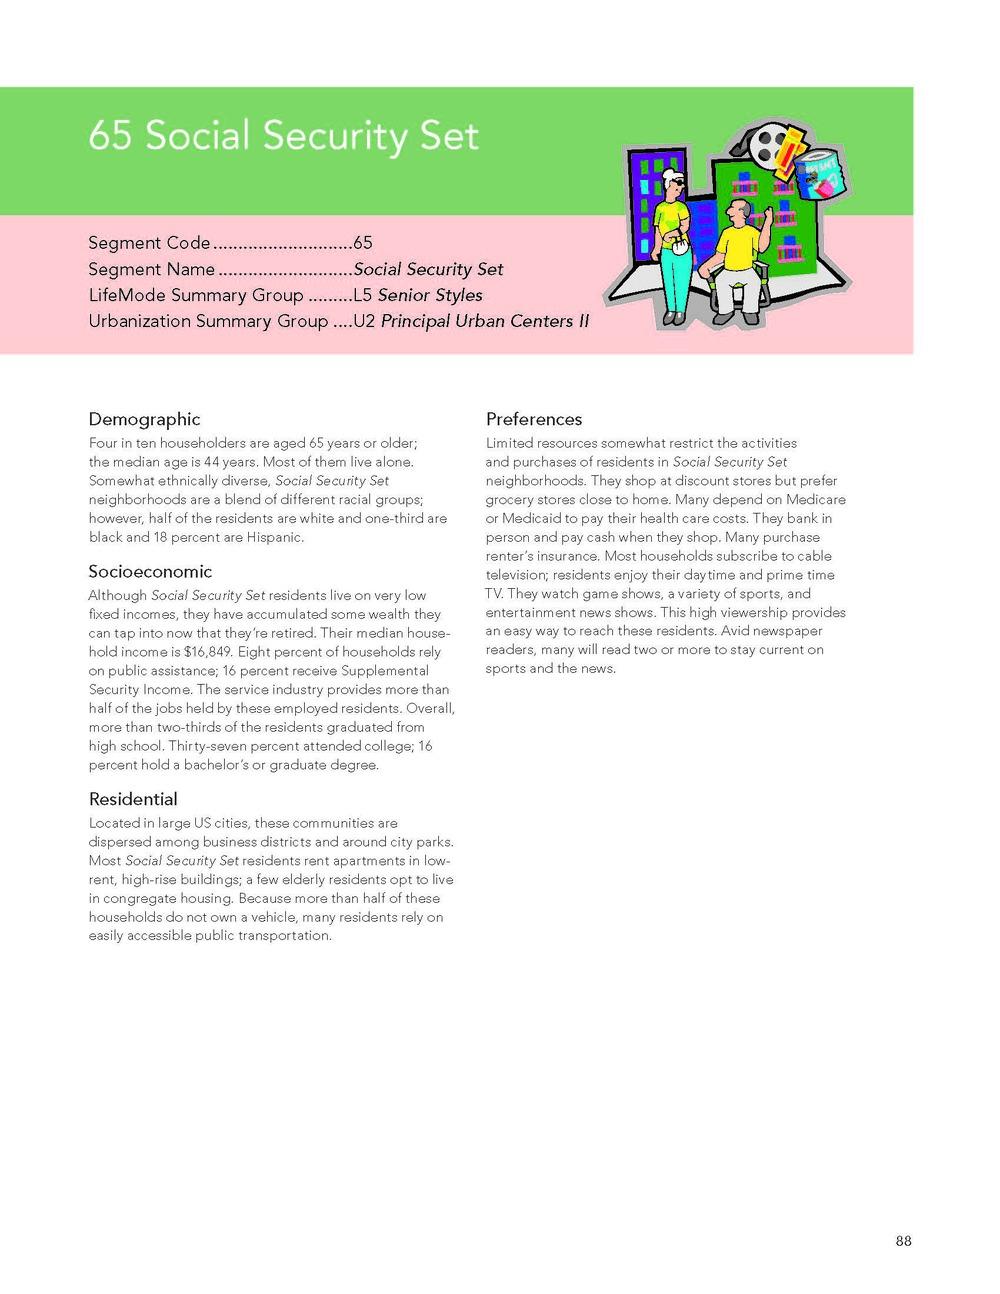 tapestry-segmentation_Page_91.jpg